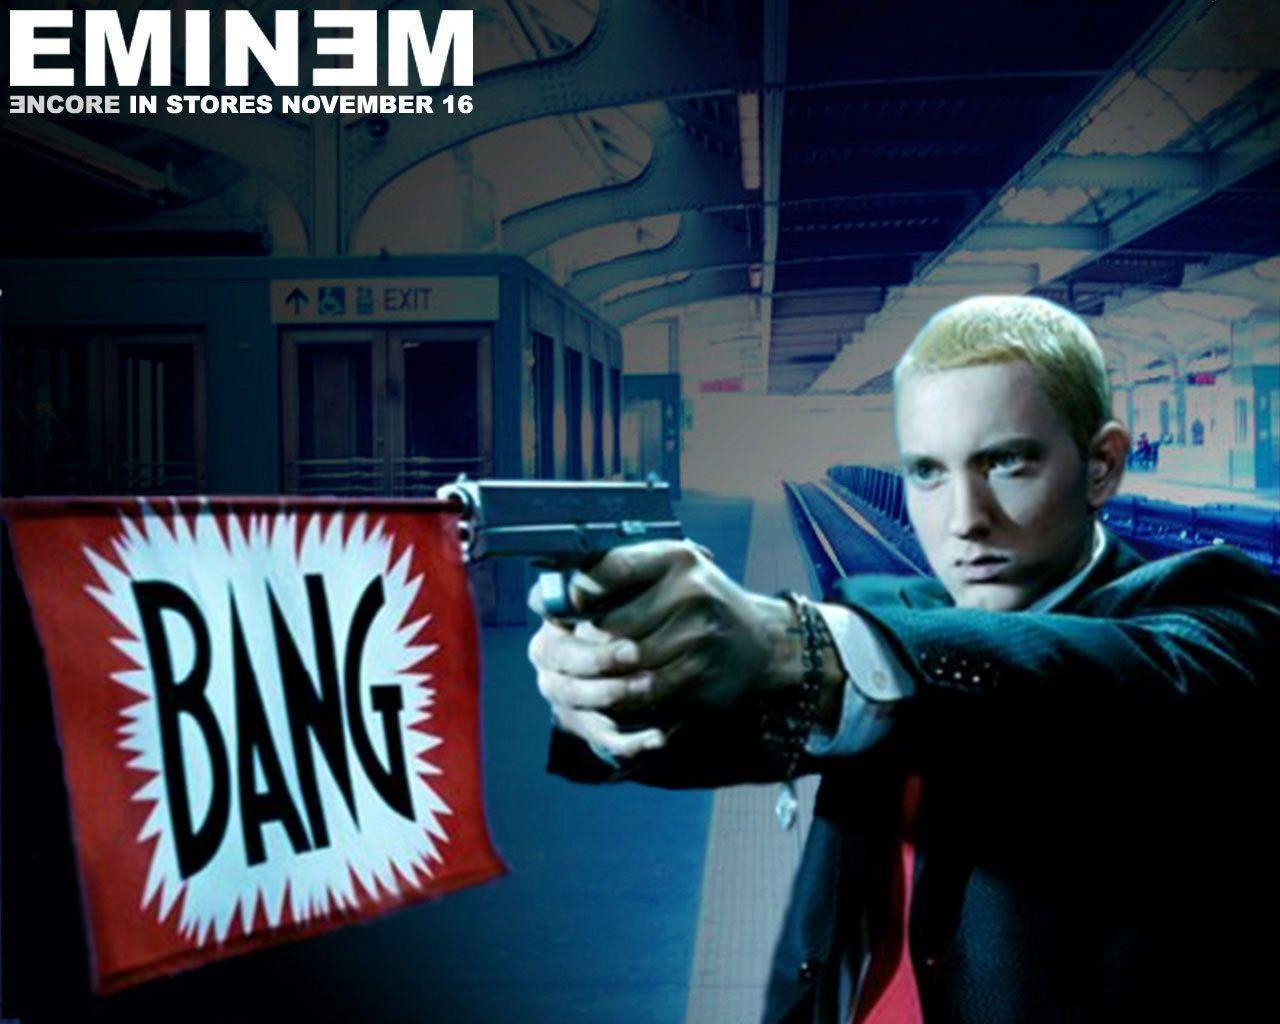 Eminem Wallpapers - EMINEM Wallpaper (7887479) - Fanpop